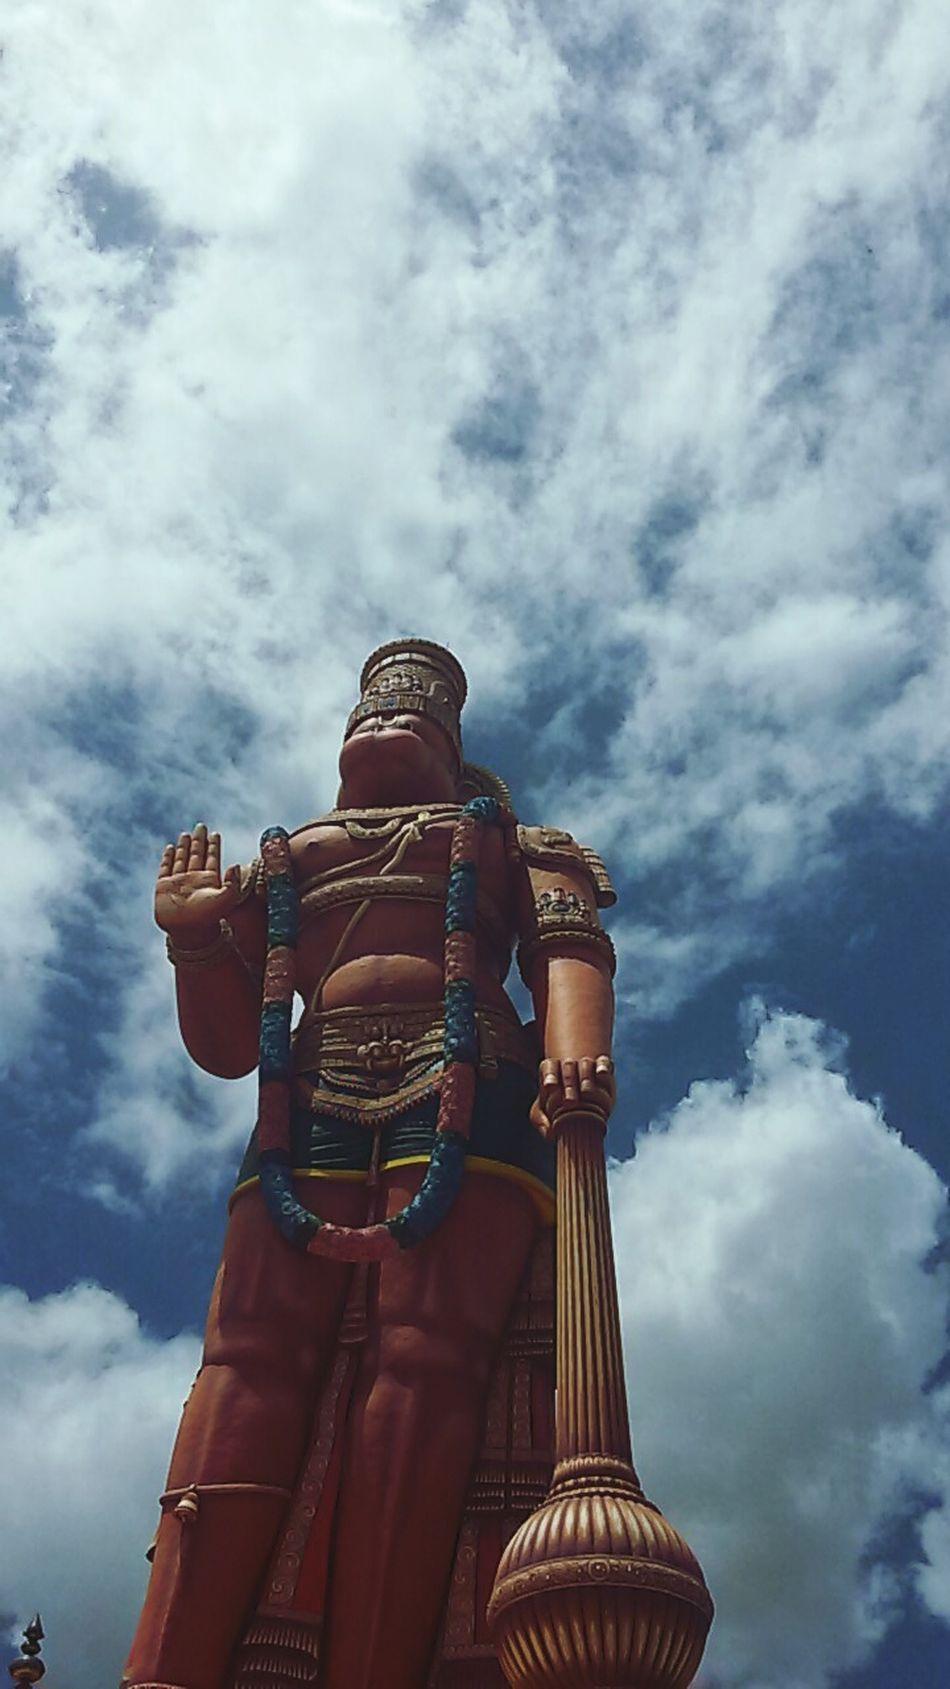 Showcase March Hanuman Dattatreya Mandir Trinidad And Tobago Sky Murti